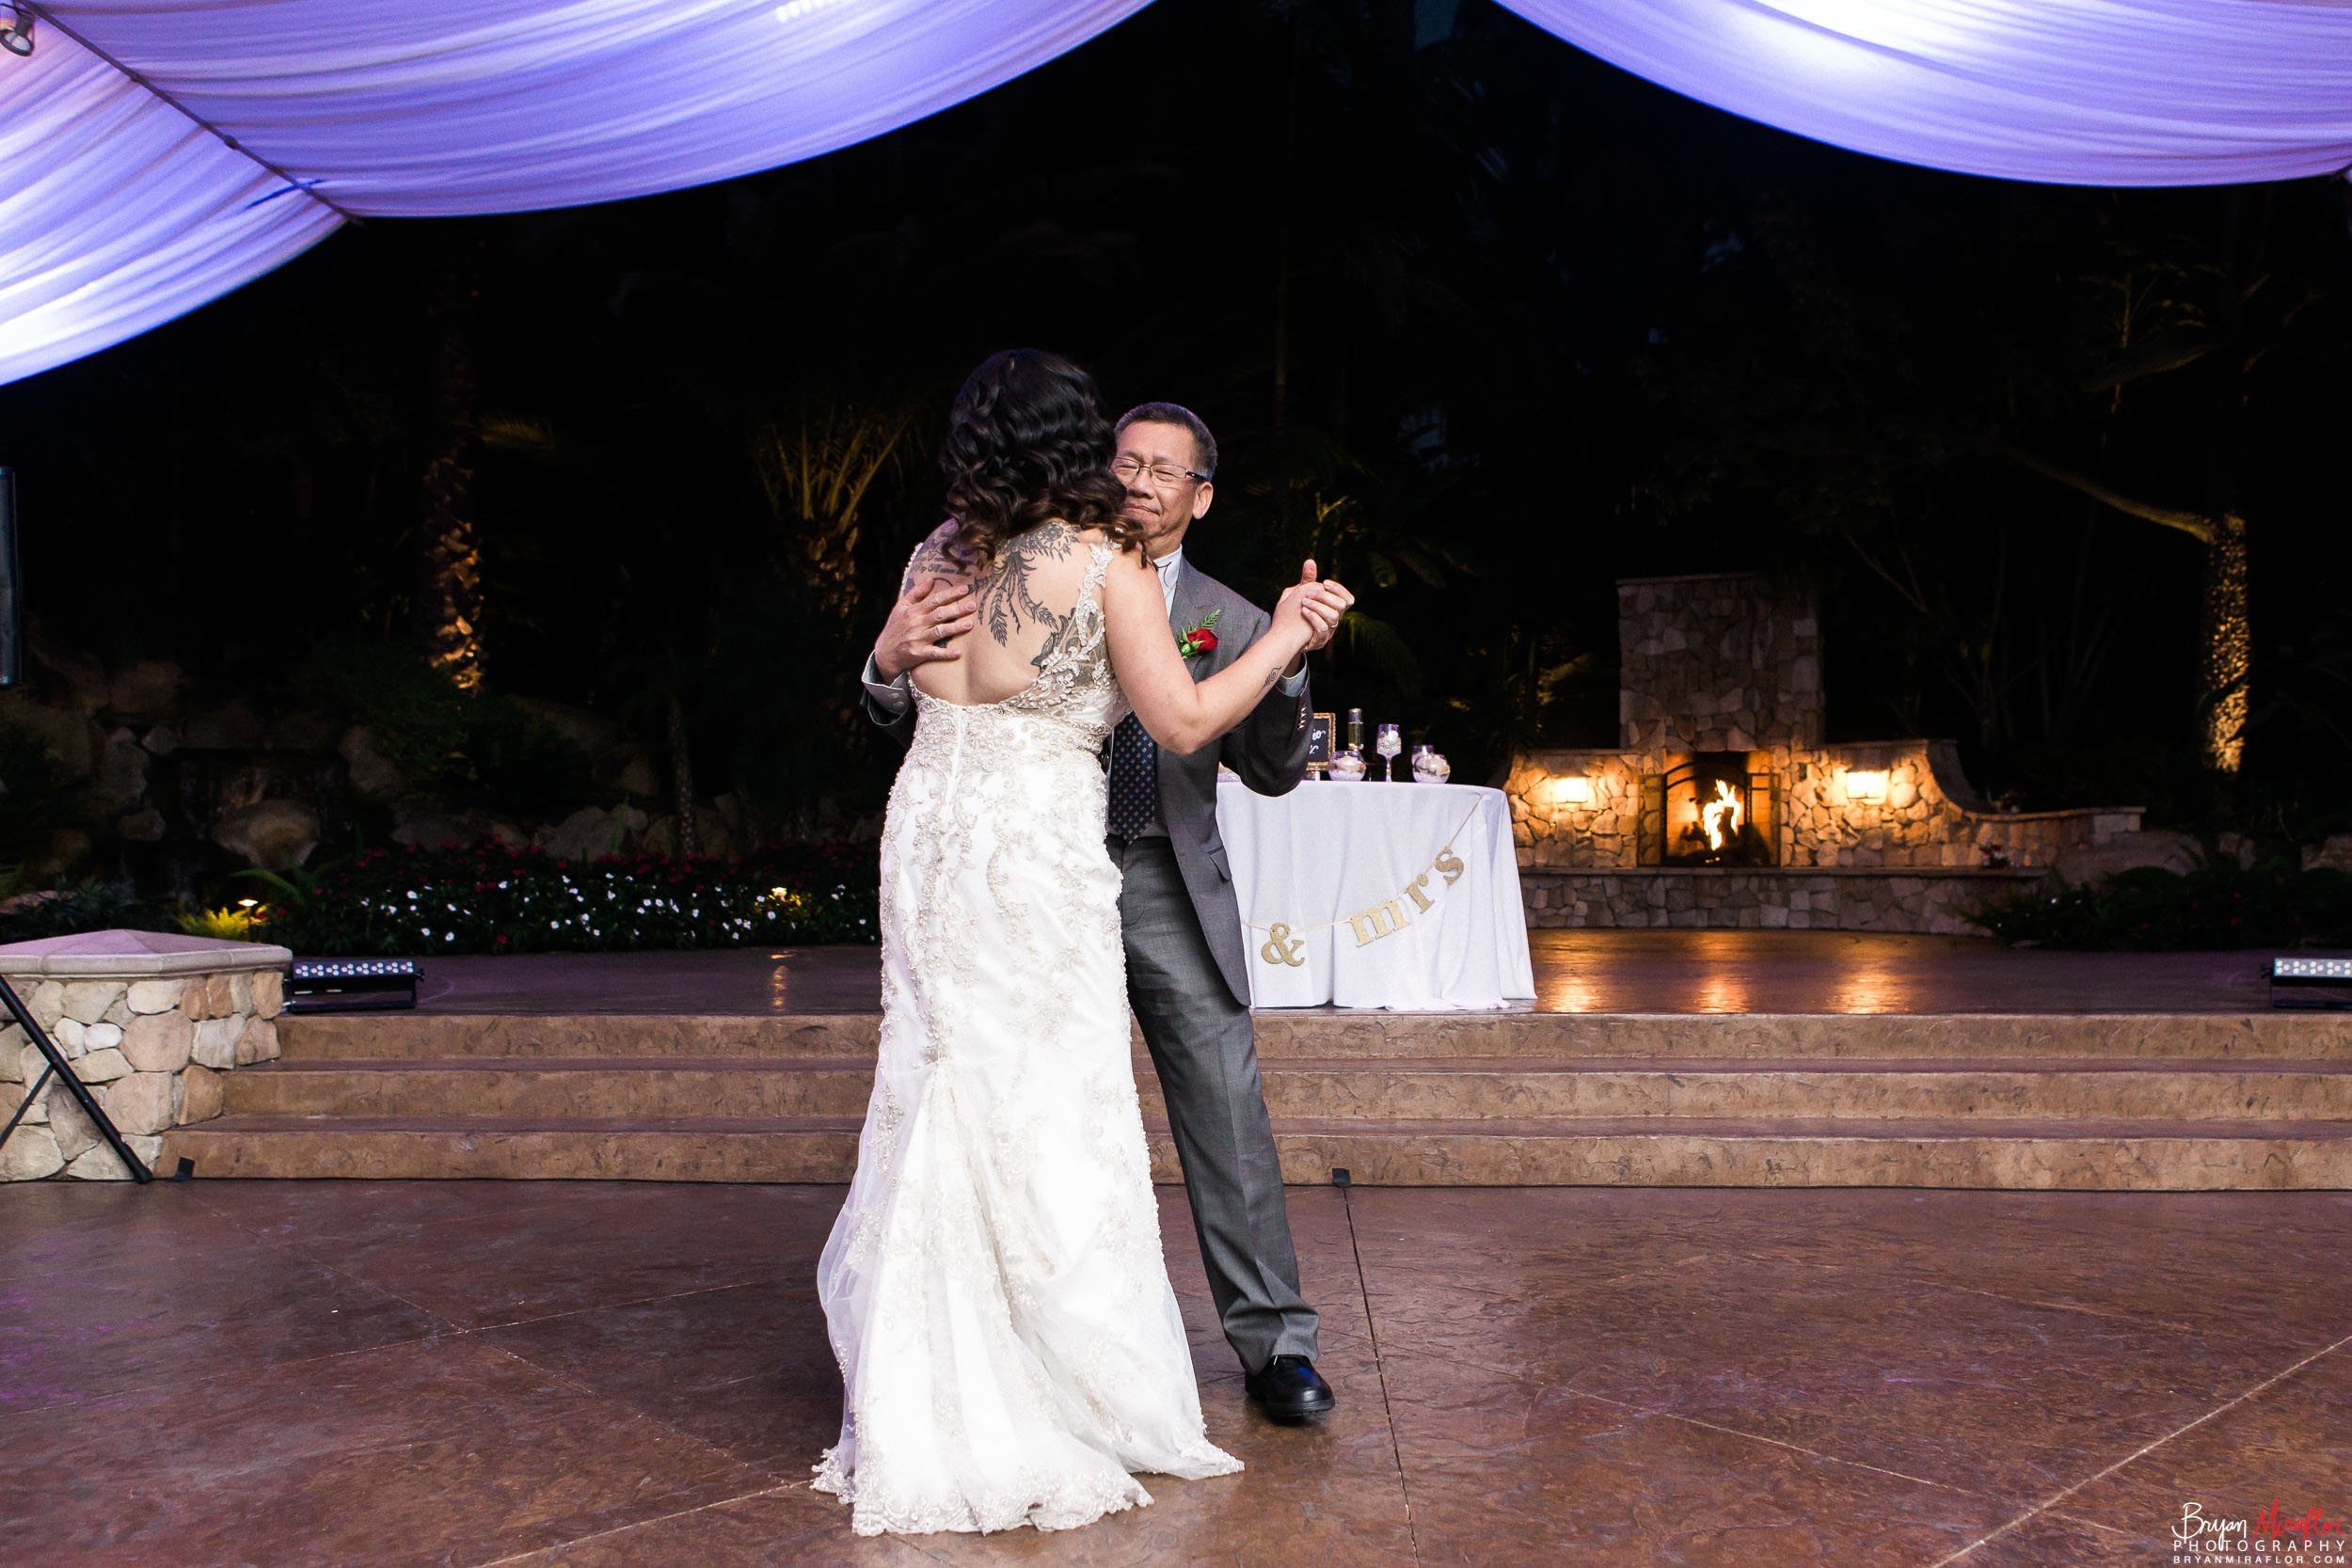 Bryan-Miraflor-Photography-Hannah-Jonathan-Married-Grand-Traditions-Estate-Gardens-Fallbrook-20171222-196.jpg